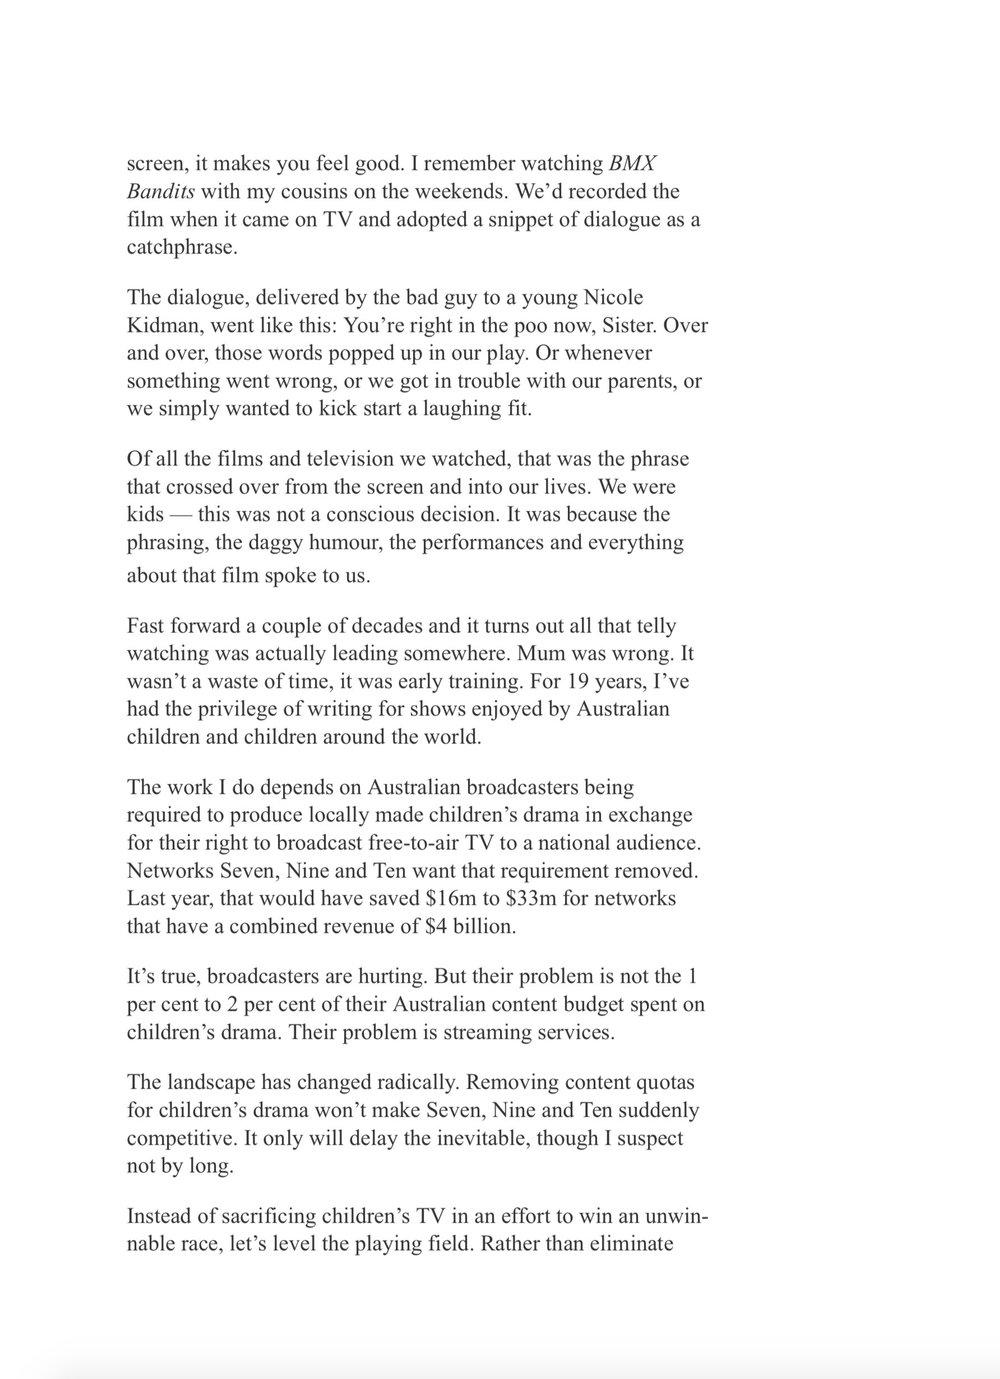 Australian_feature_article_Kids_TV_3